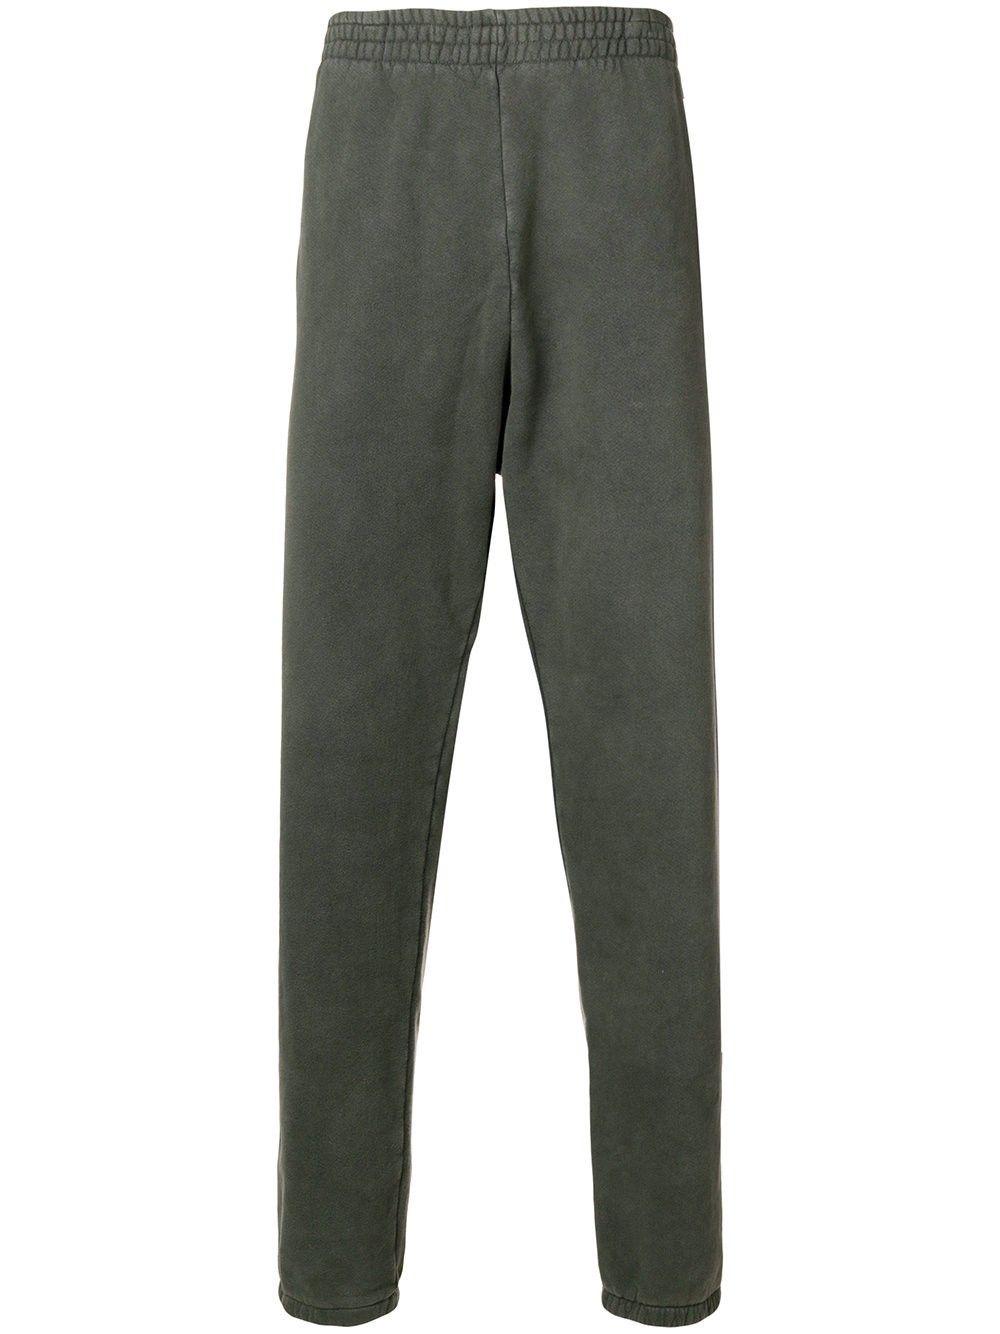 new styles 69375 25411 Yeezy Season 6 Sweatpants - XL